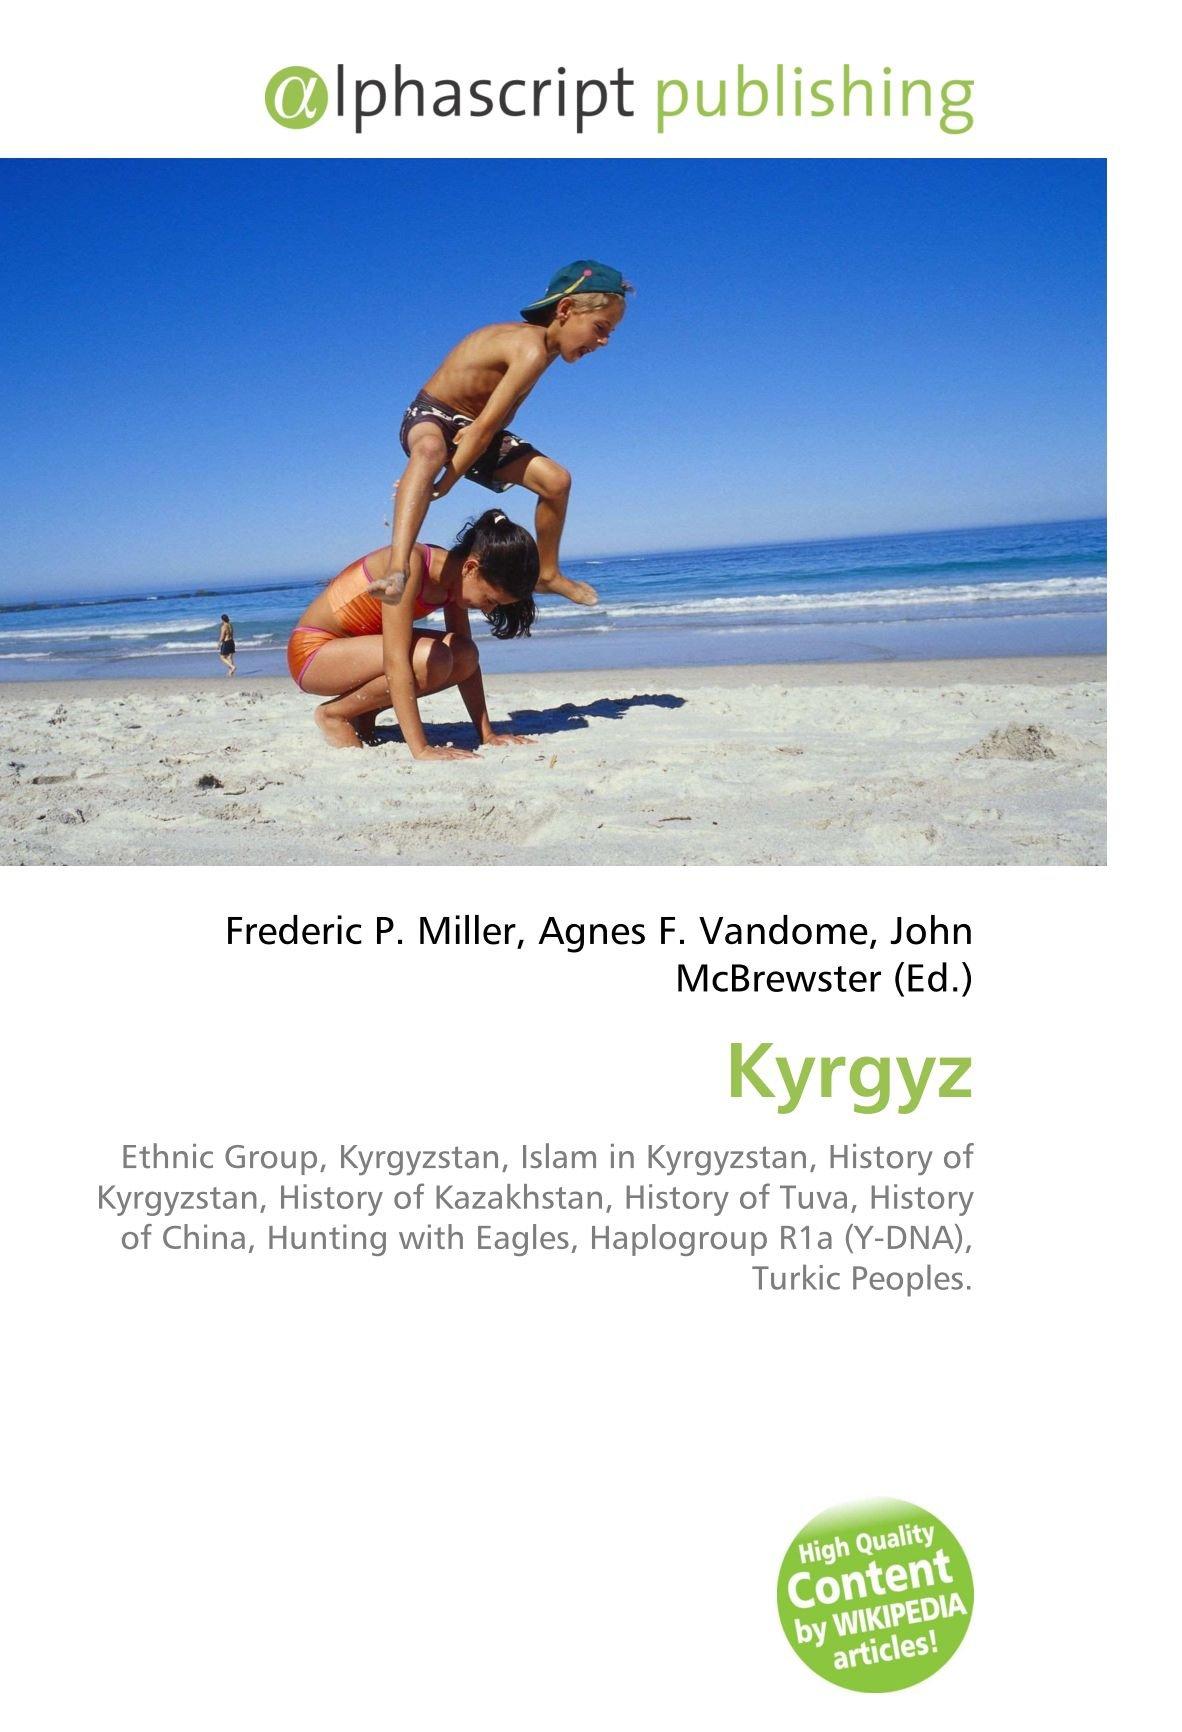 Amazon fr - Kyrgyz: Ethnic Group, Kyrgyzstan, Islam in Kyrgyzstan